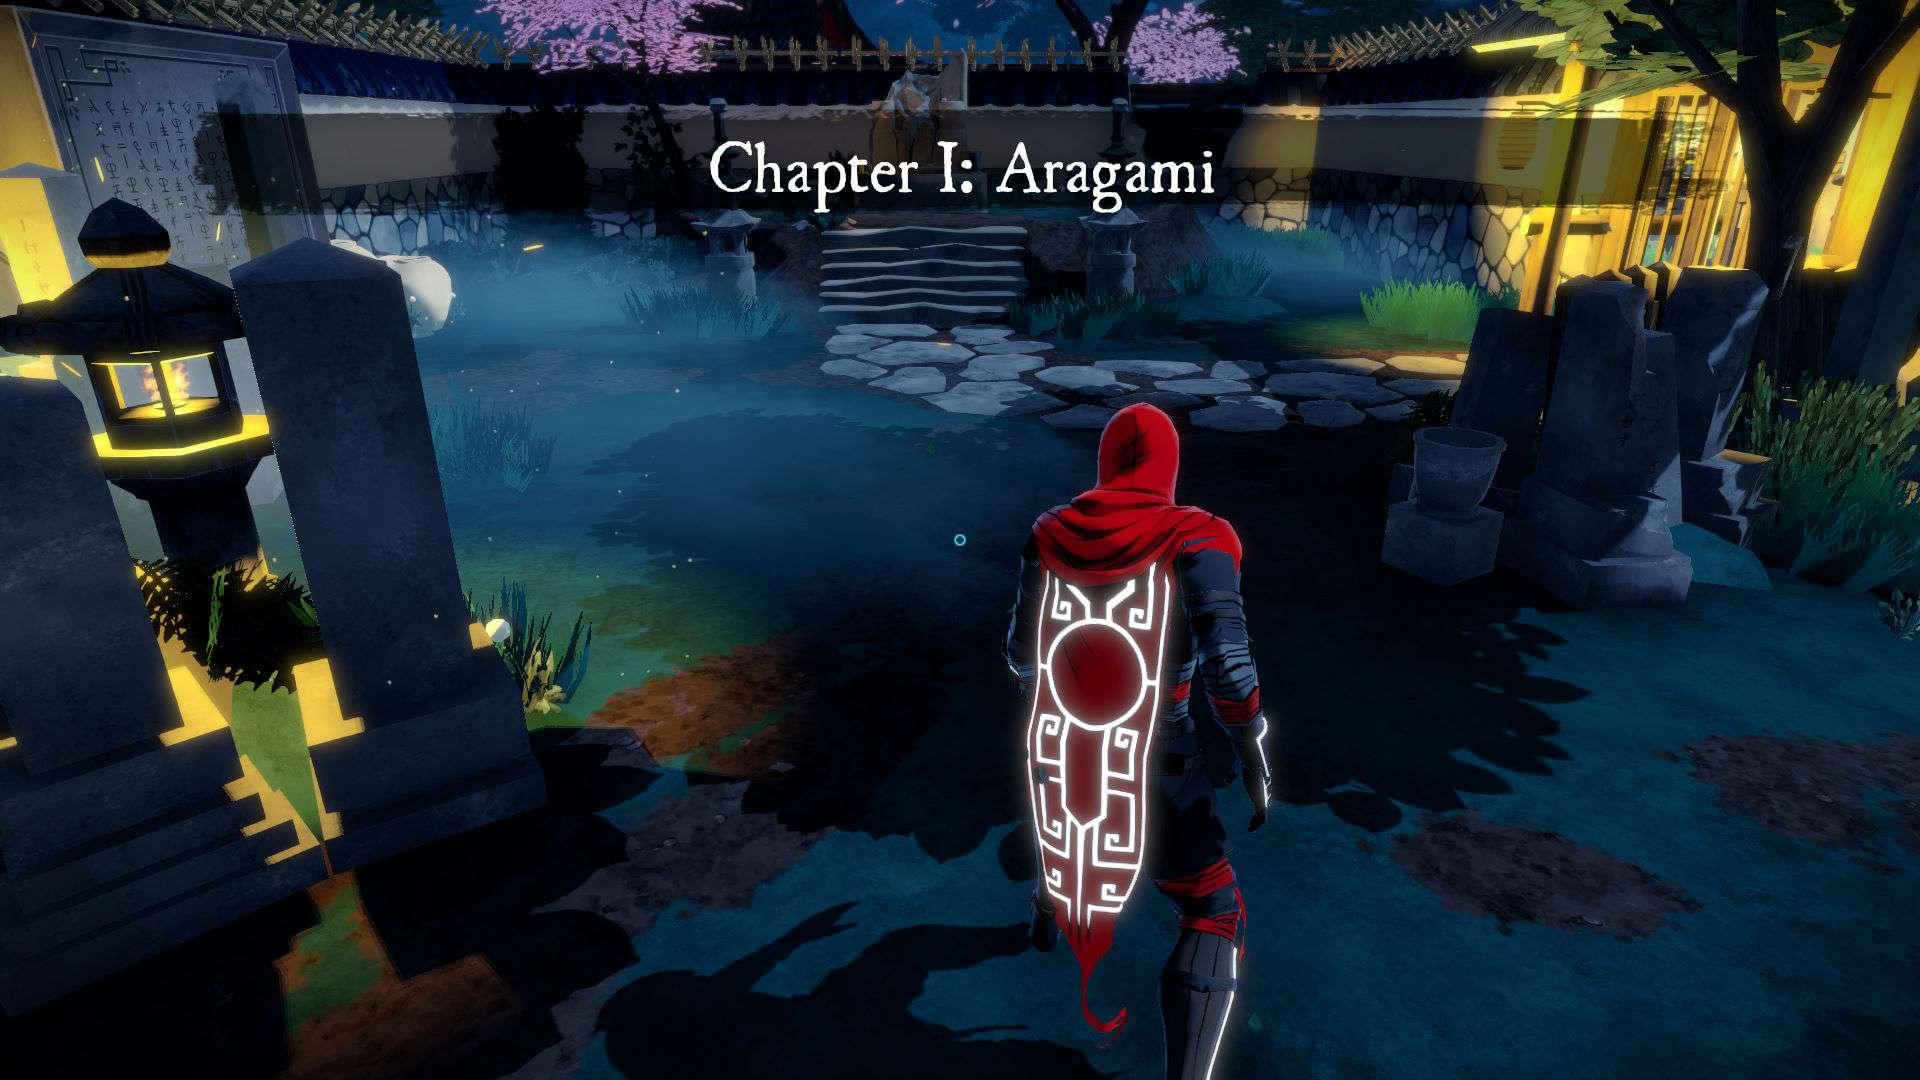 Aragami [v01.01b] | PC | RePack �� Saverneo